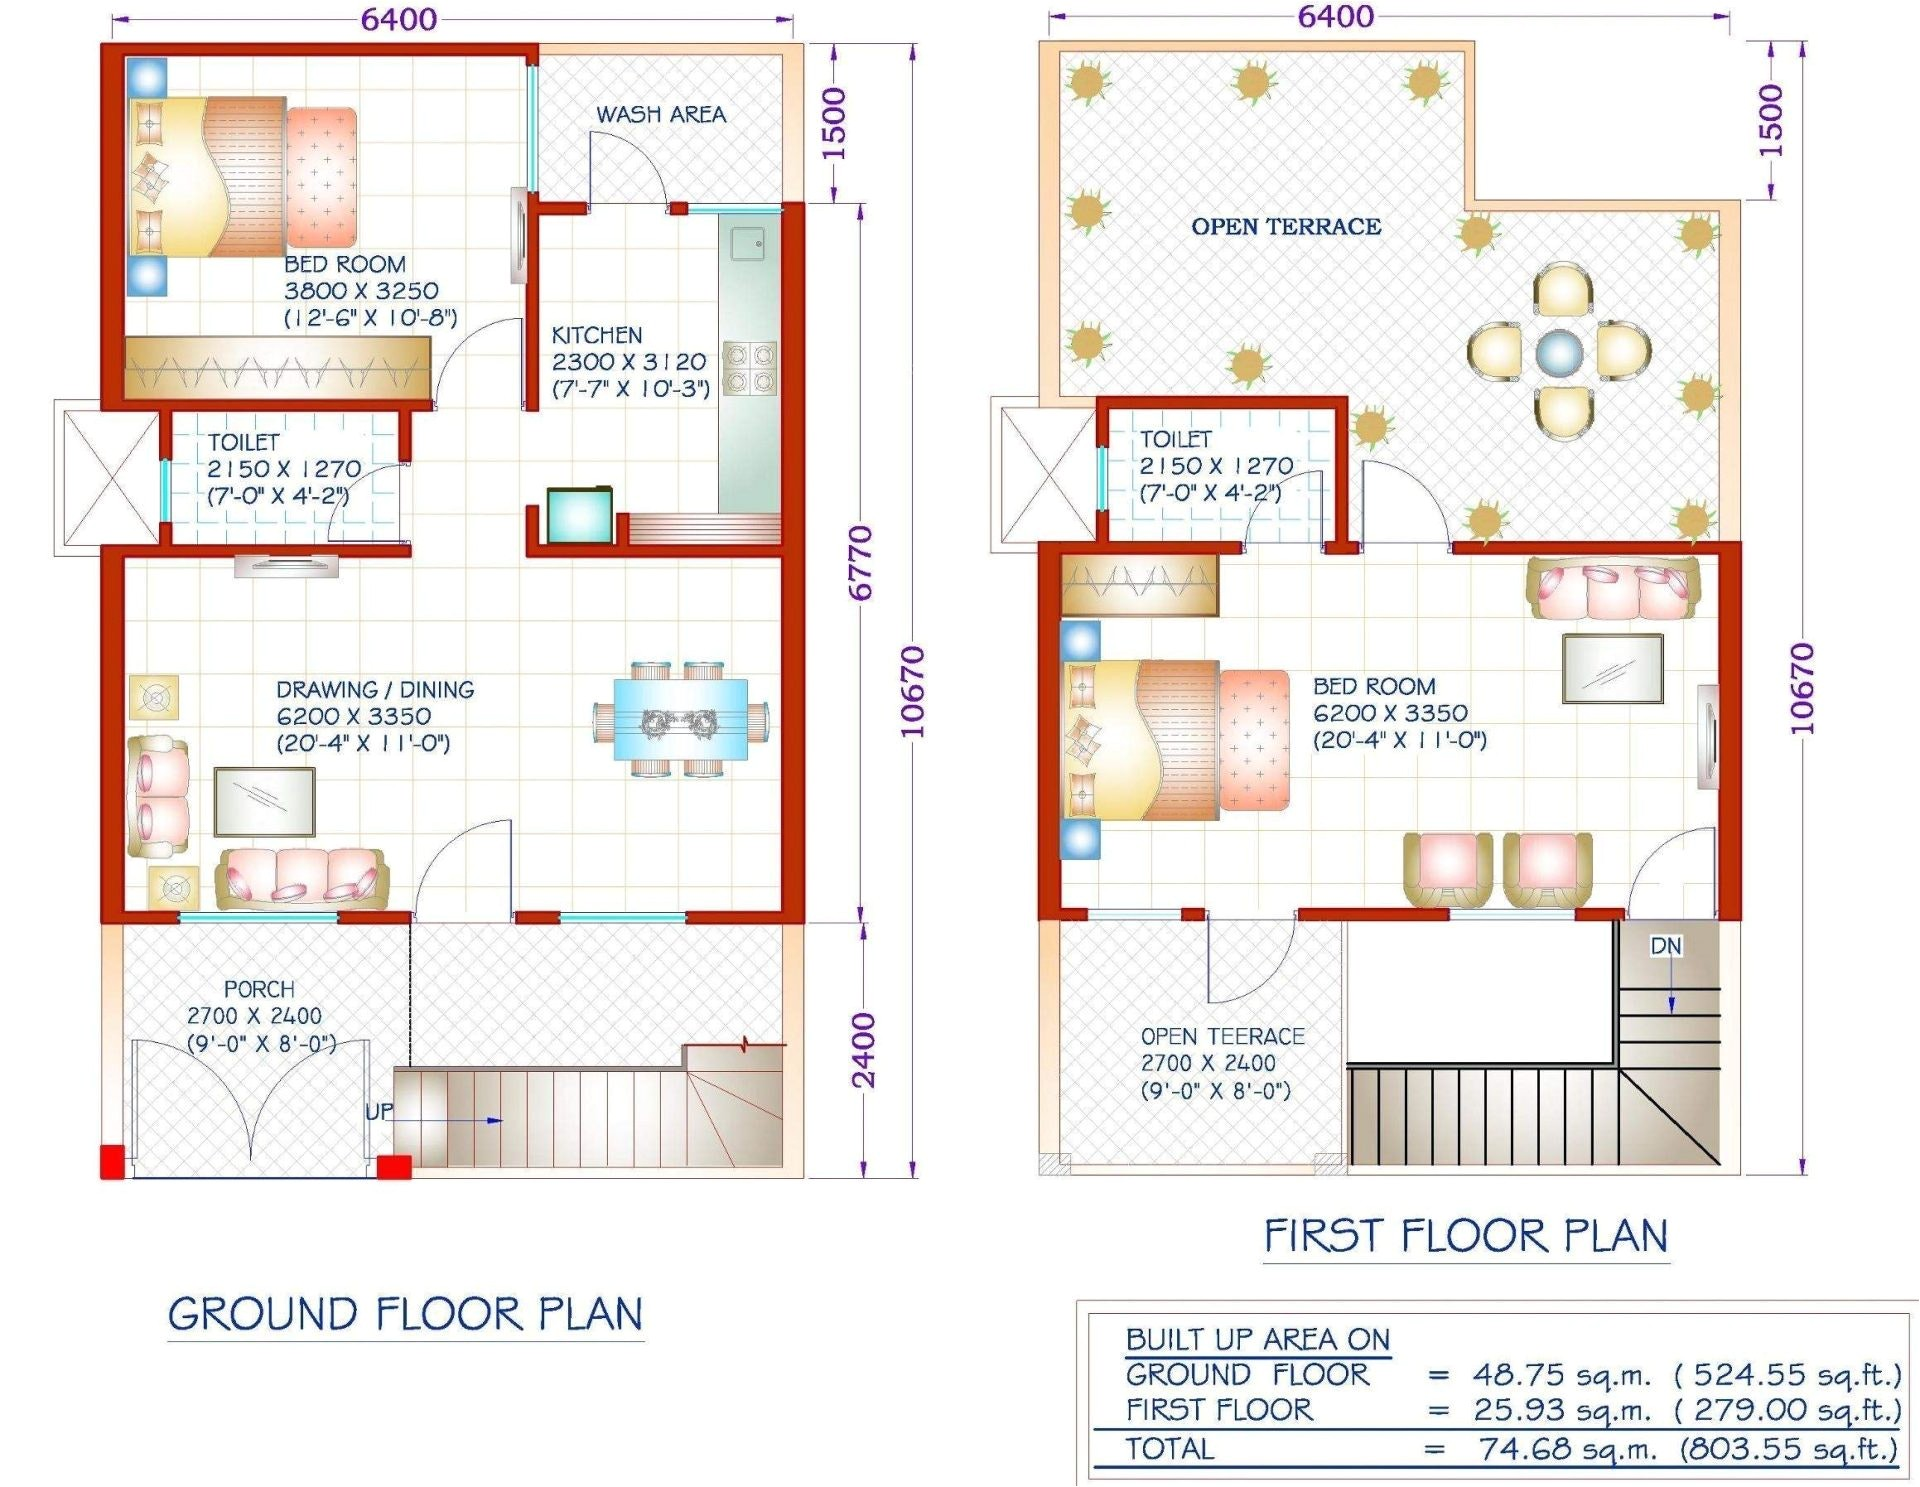 20 x 40 duplex house plans 800 square feet